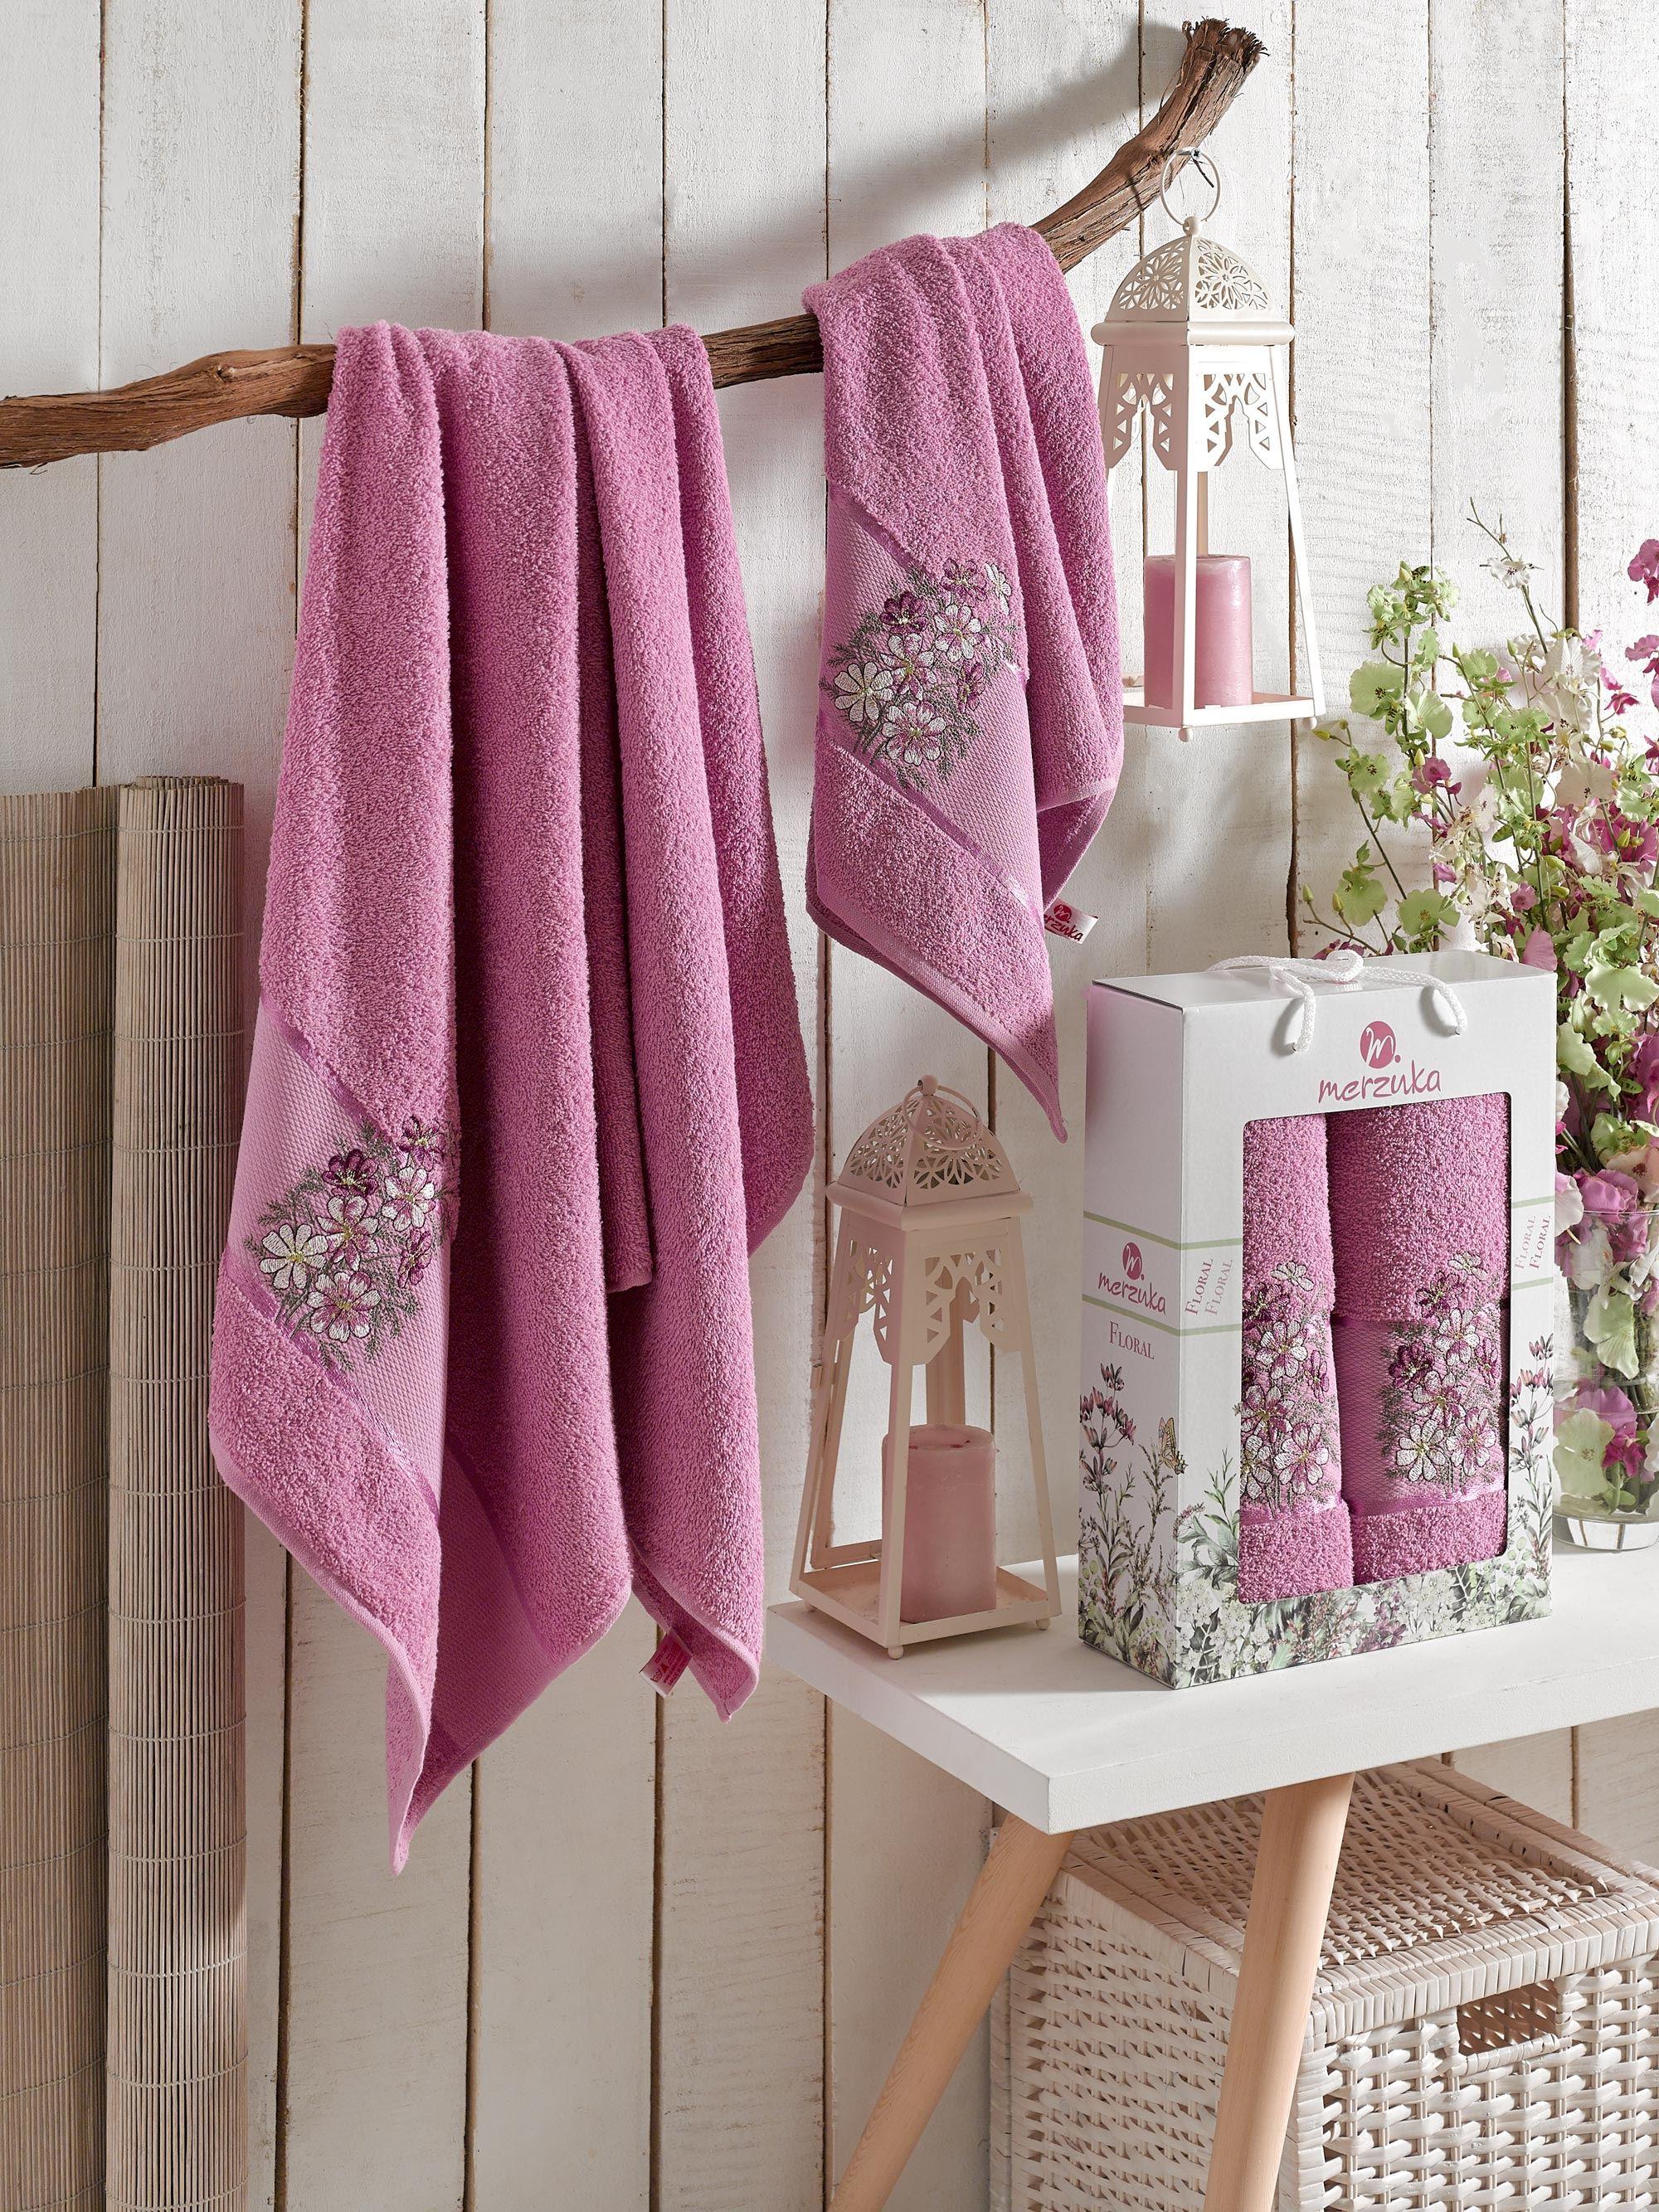 Полотенца Oran Merzuka Полотенце Floral Цвет: Светло-Лиловый (50х80 см,70х130 см) полотенца oran merzuka полотенце sakura цвет светло лиловый набор